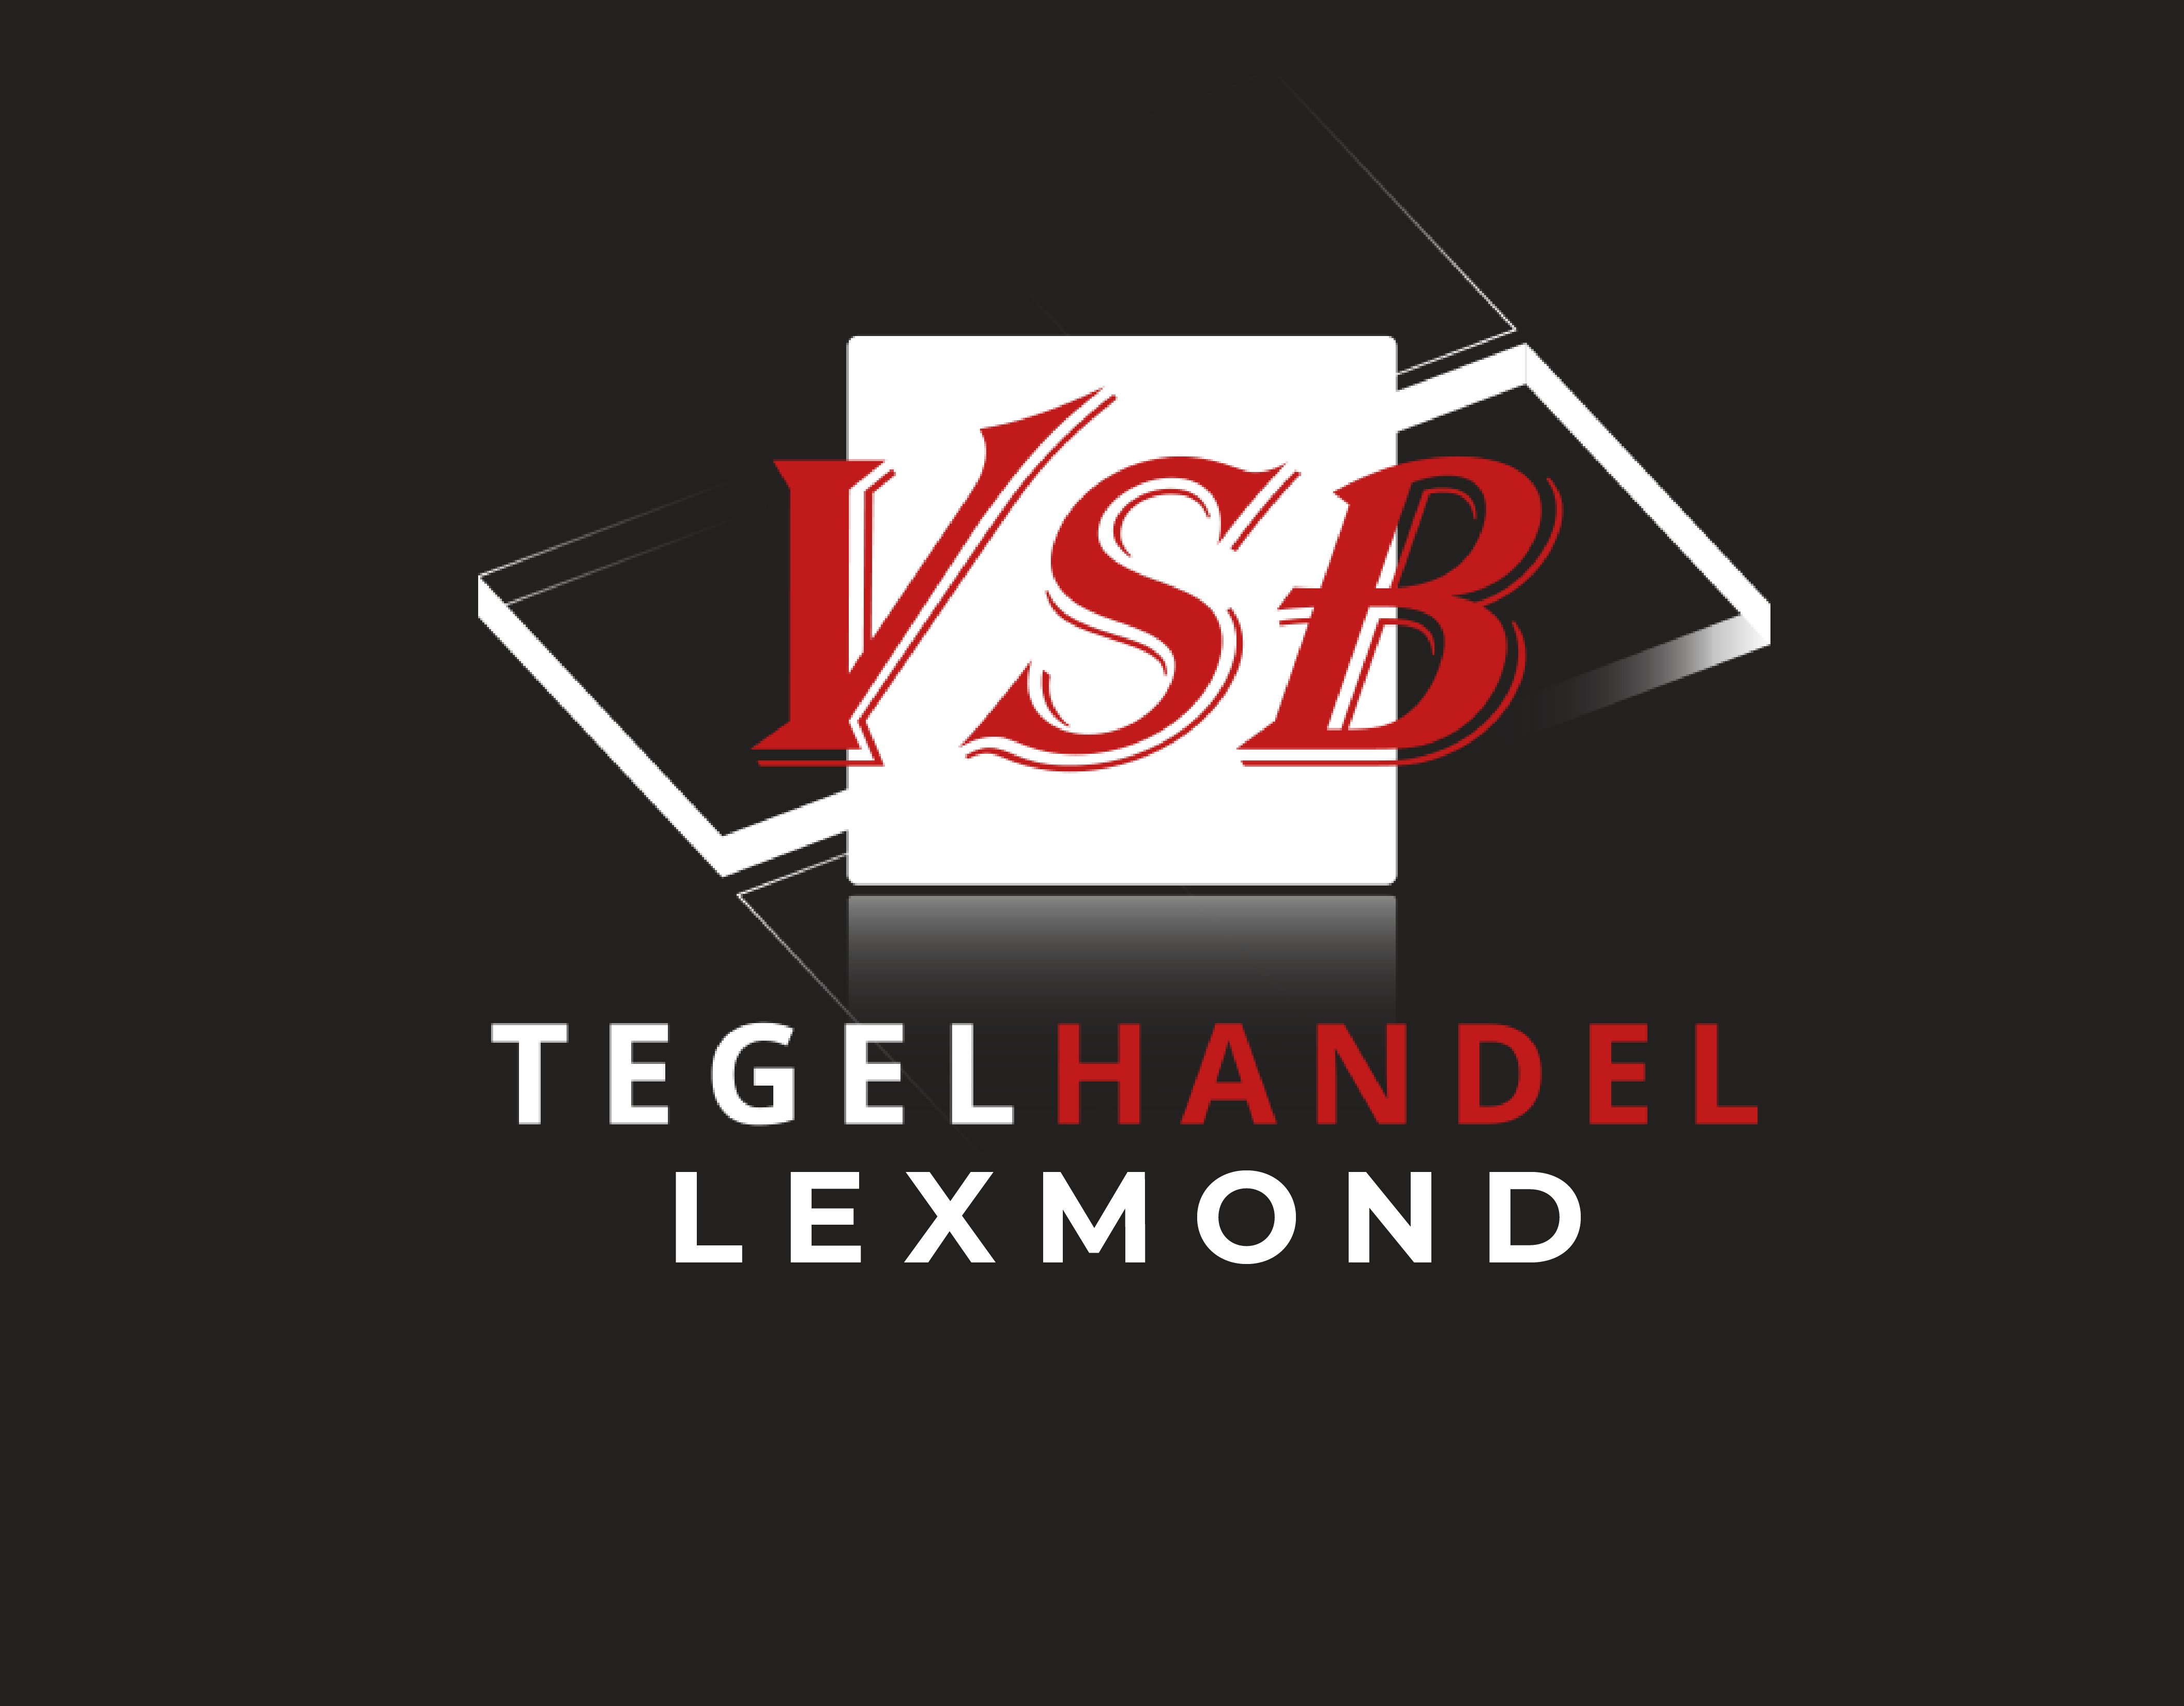 VSB Lexmond